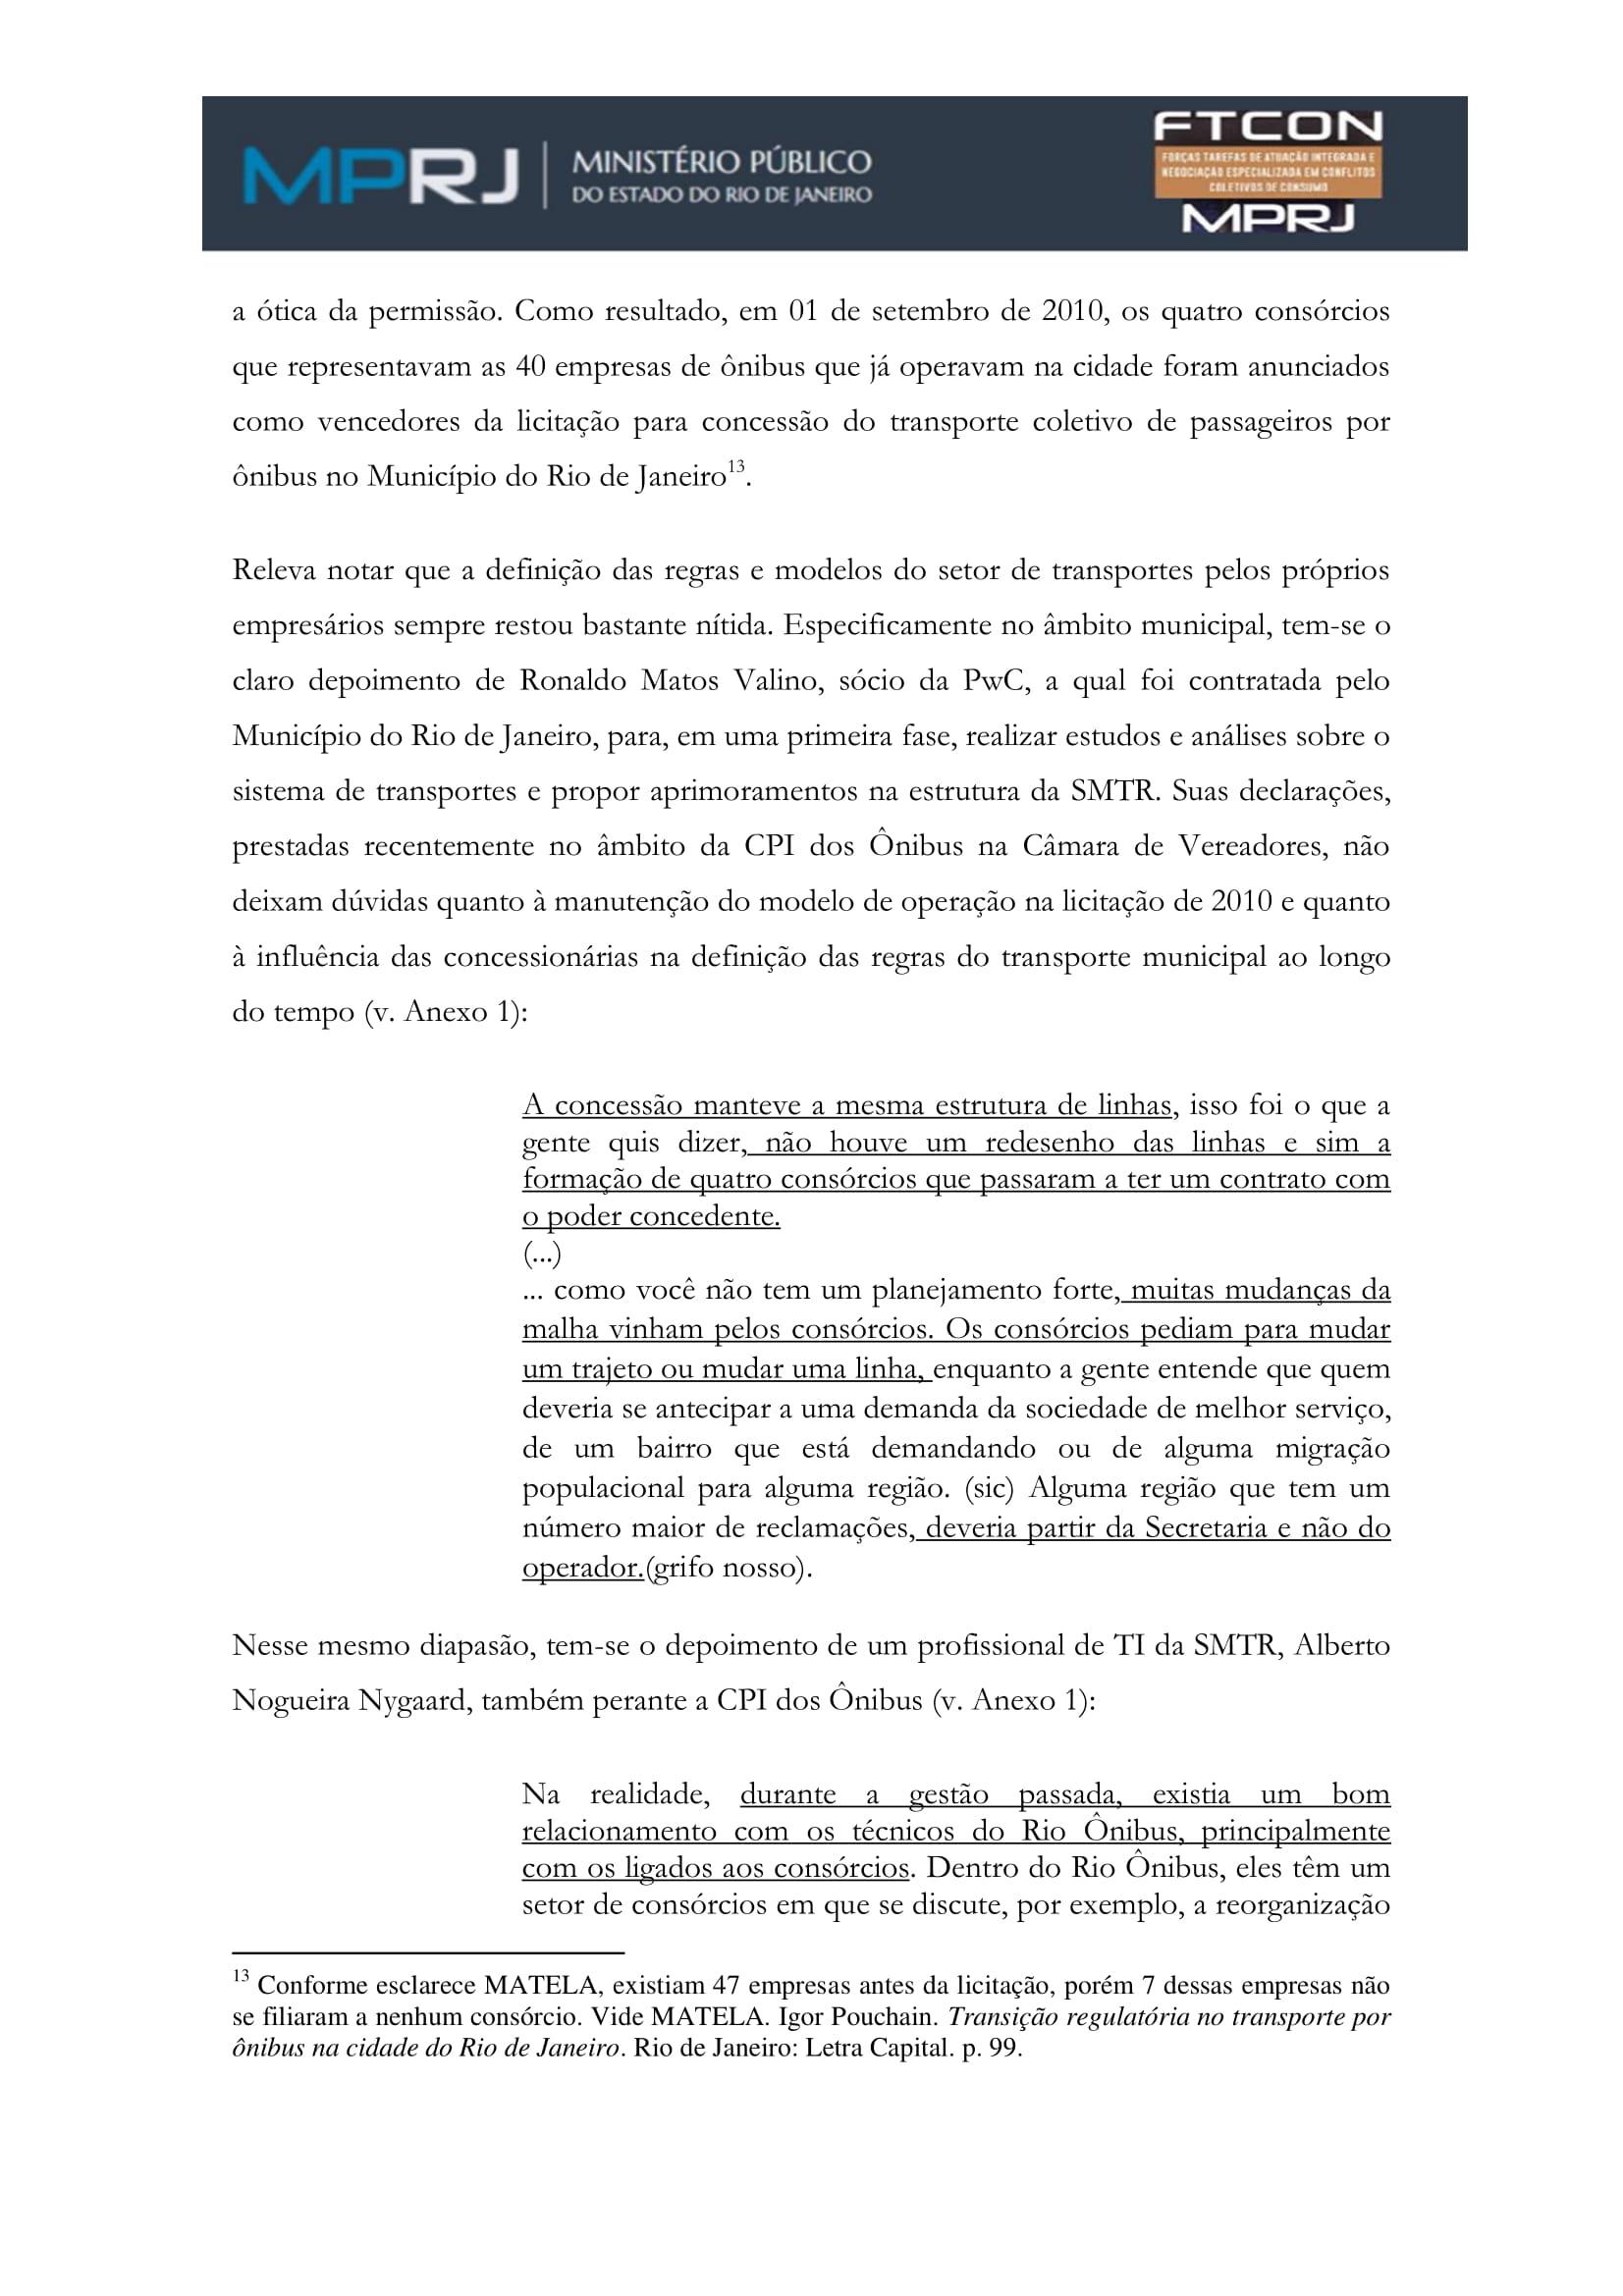 acp_caducidade_onibus_dr_rt-015